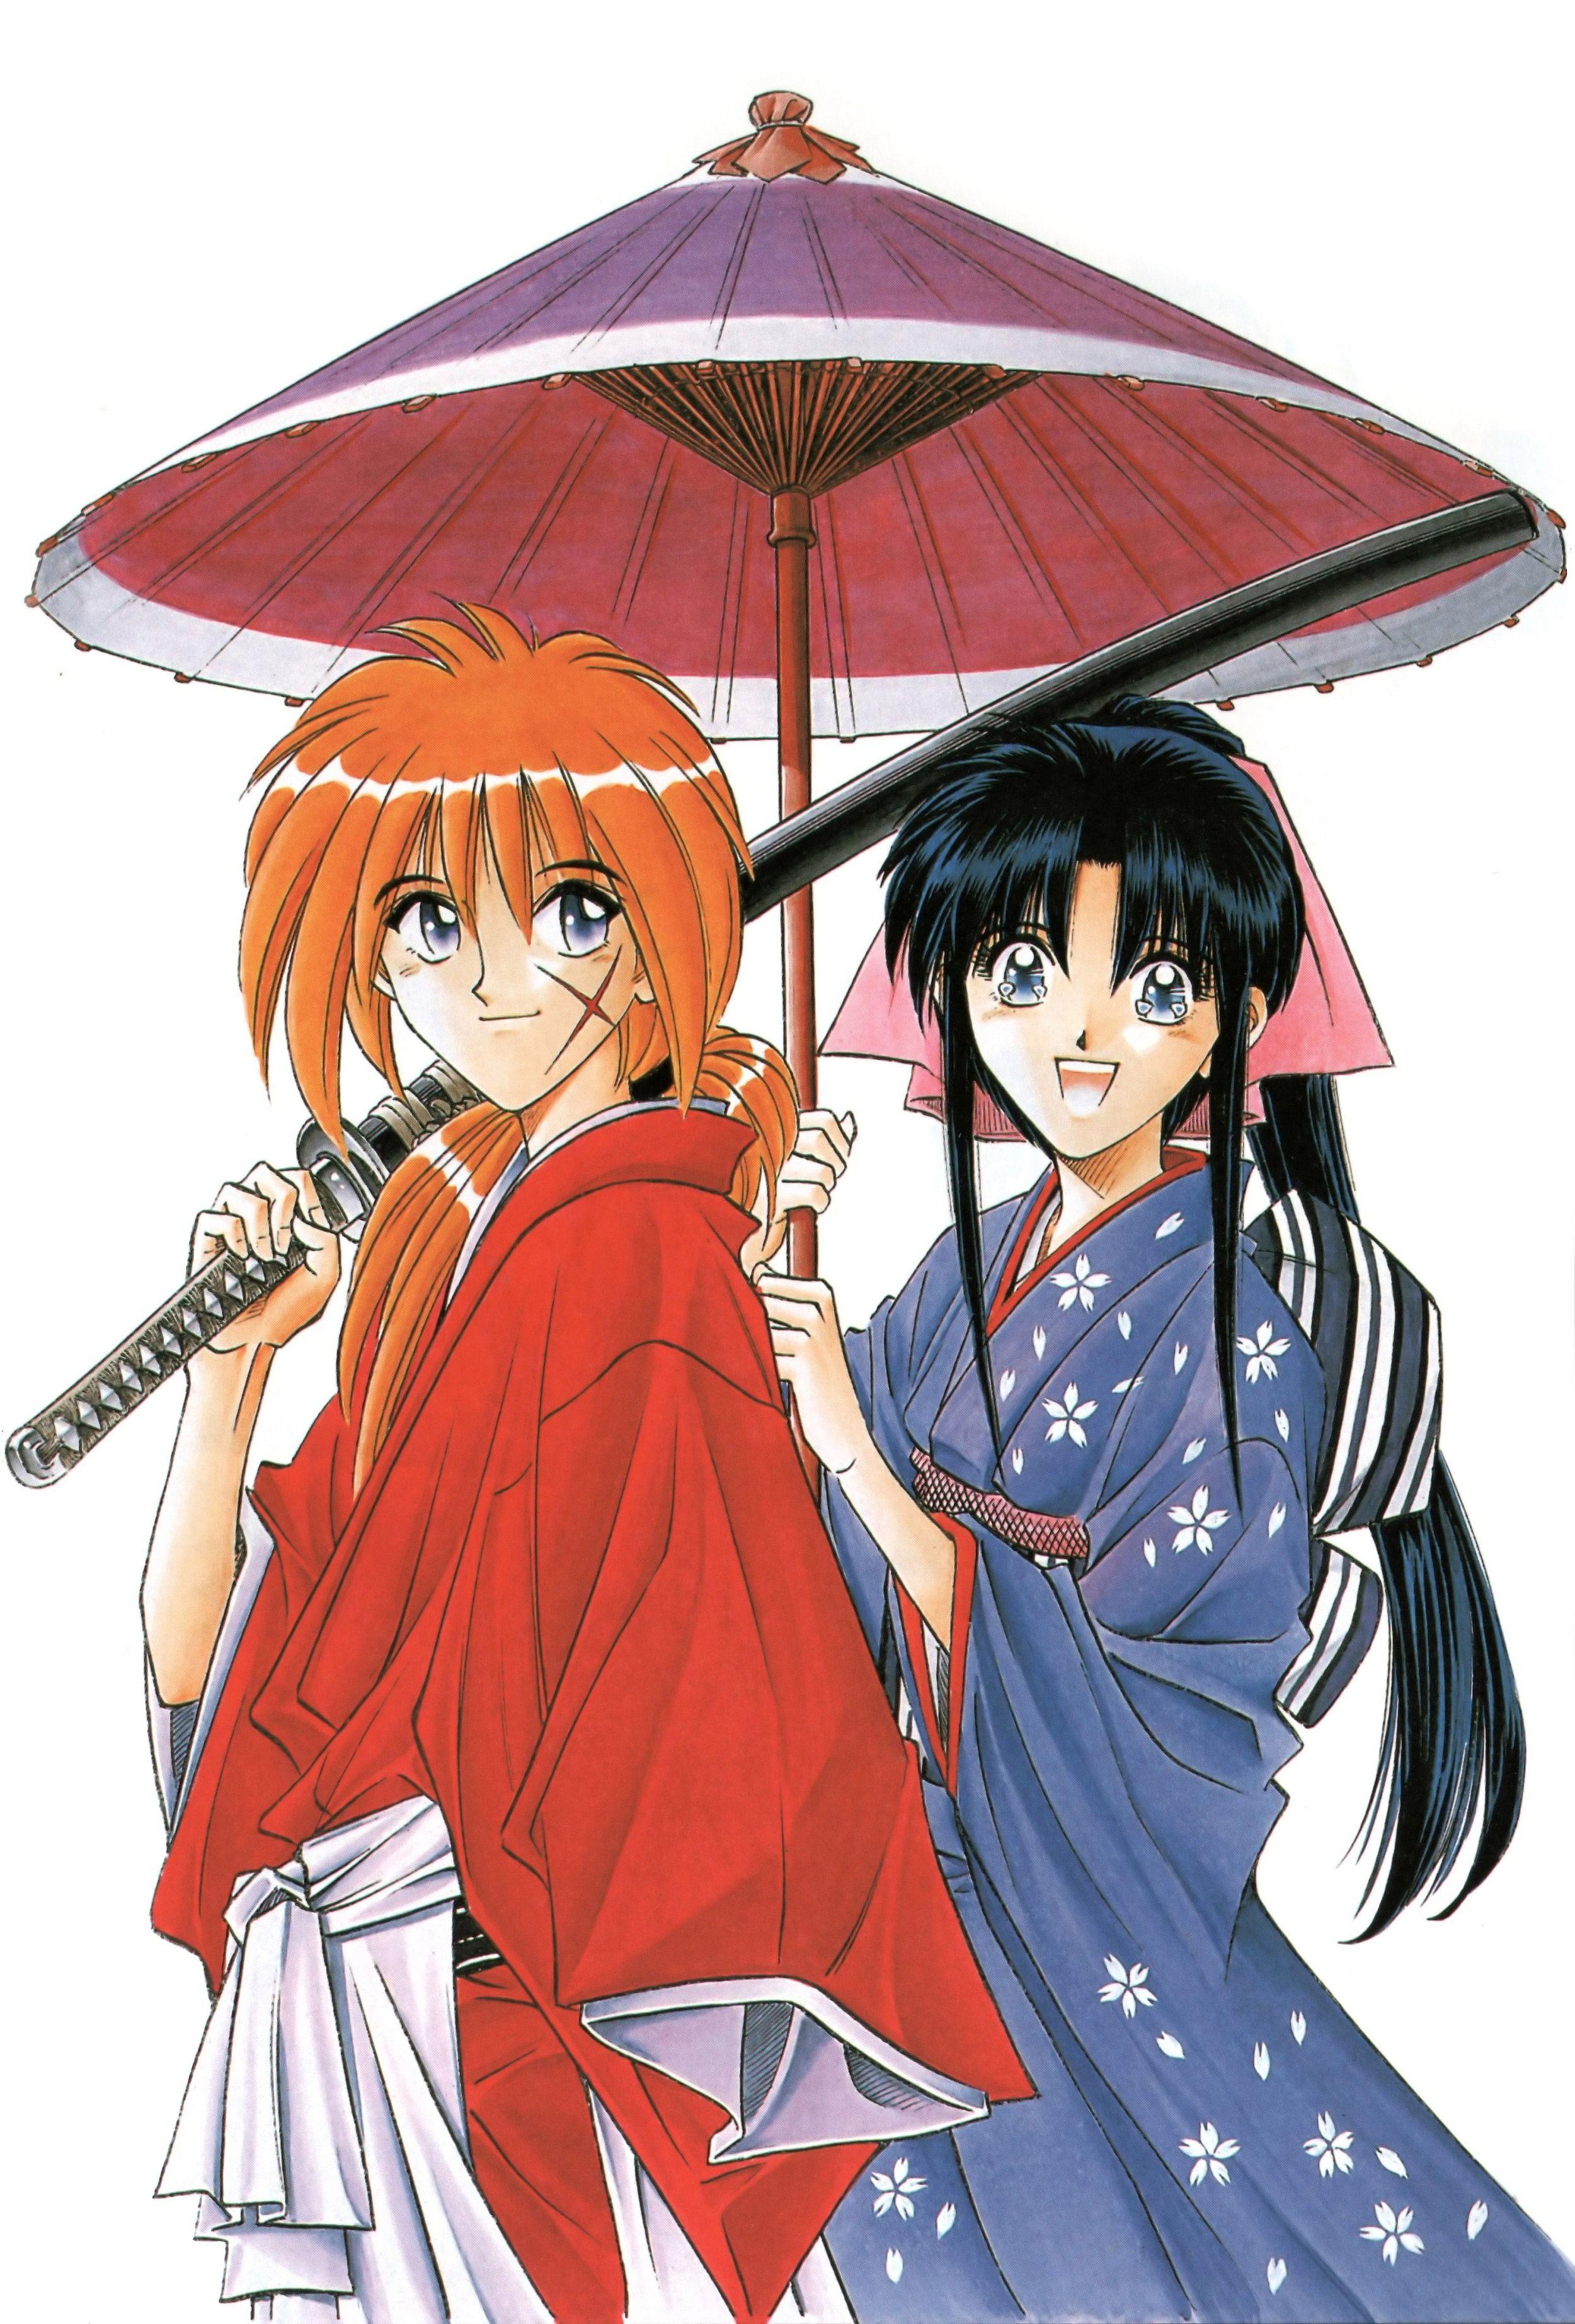 Rurouni kenshin kenshin himura and kaoru kamiya i love this show so much